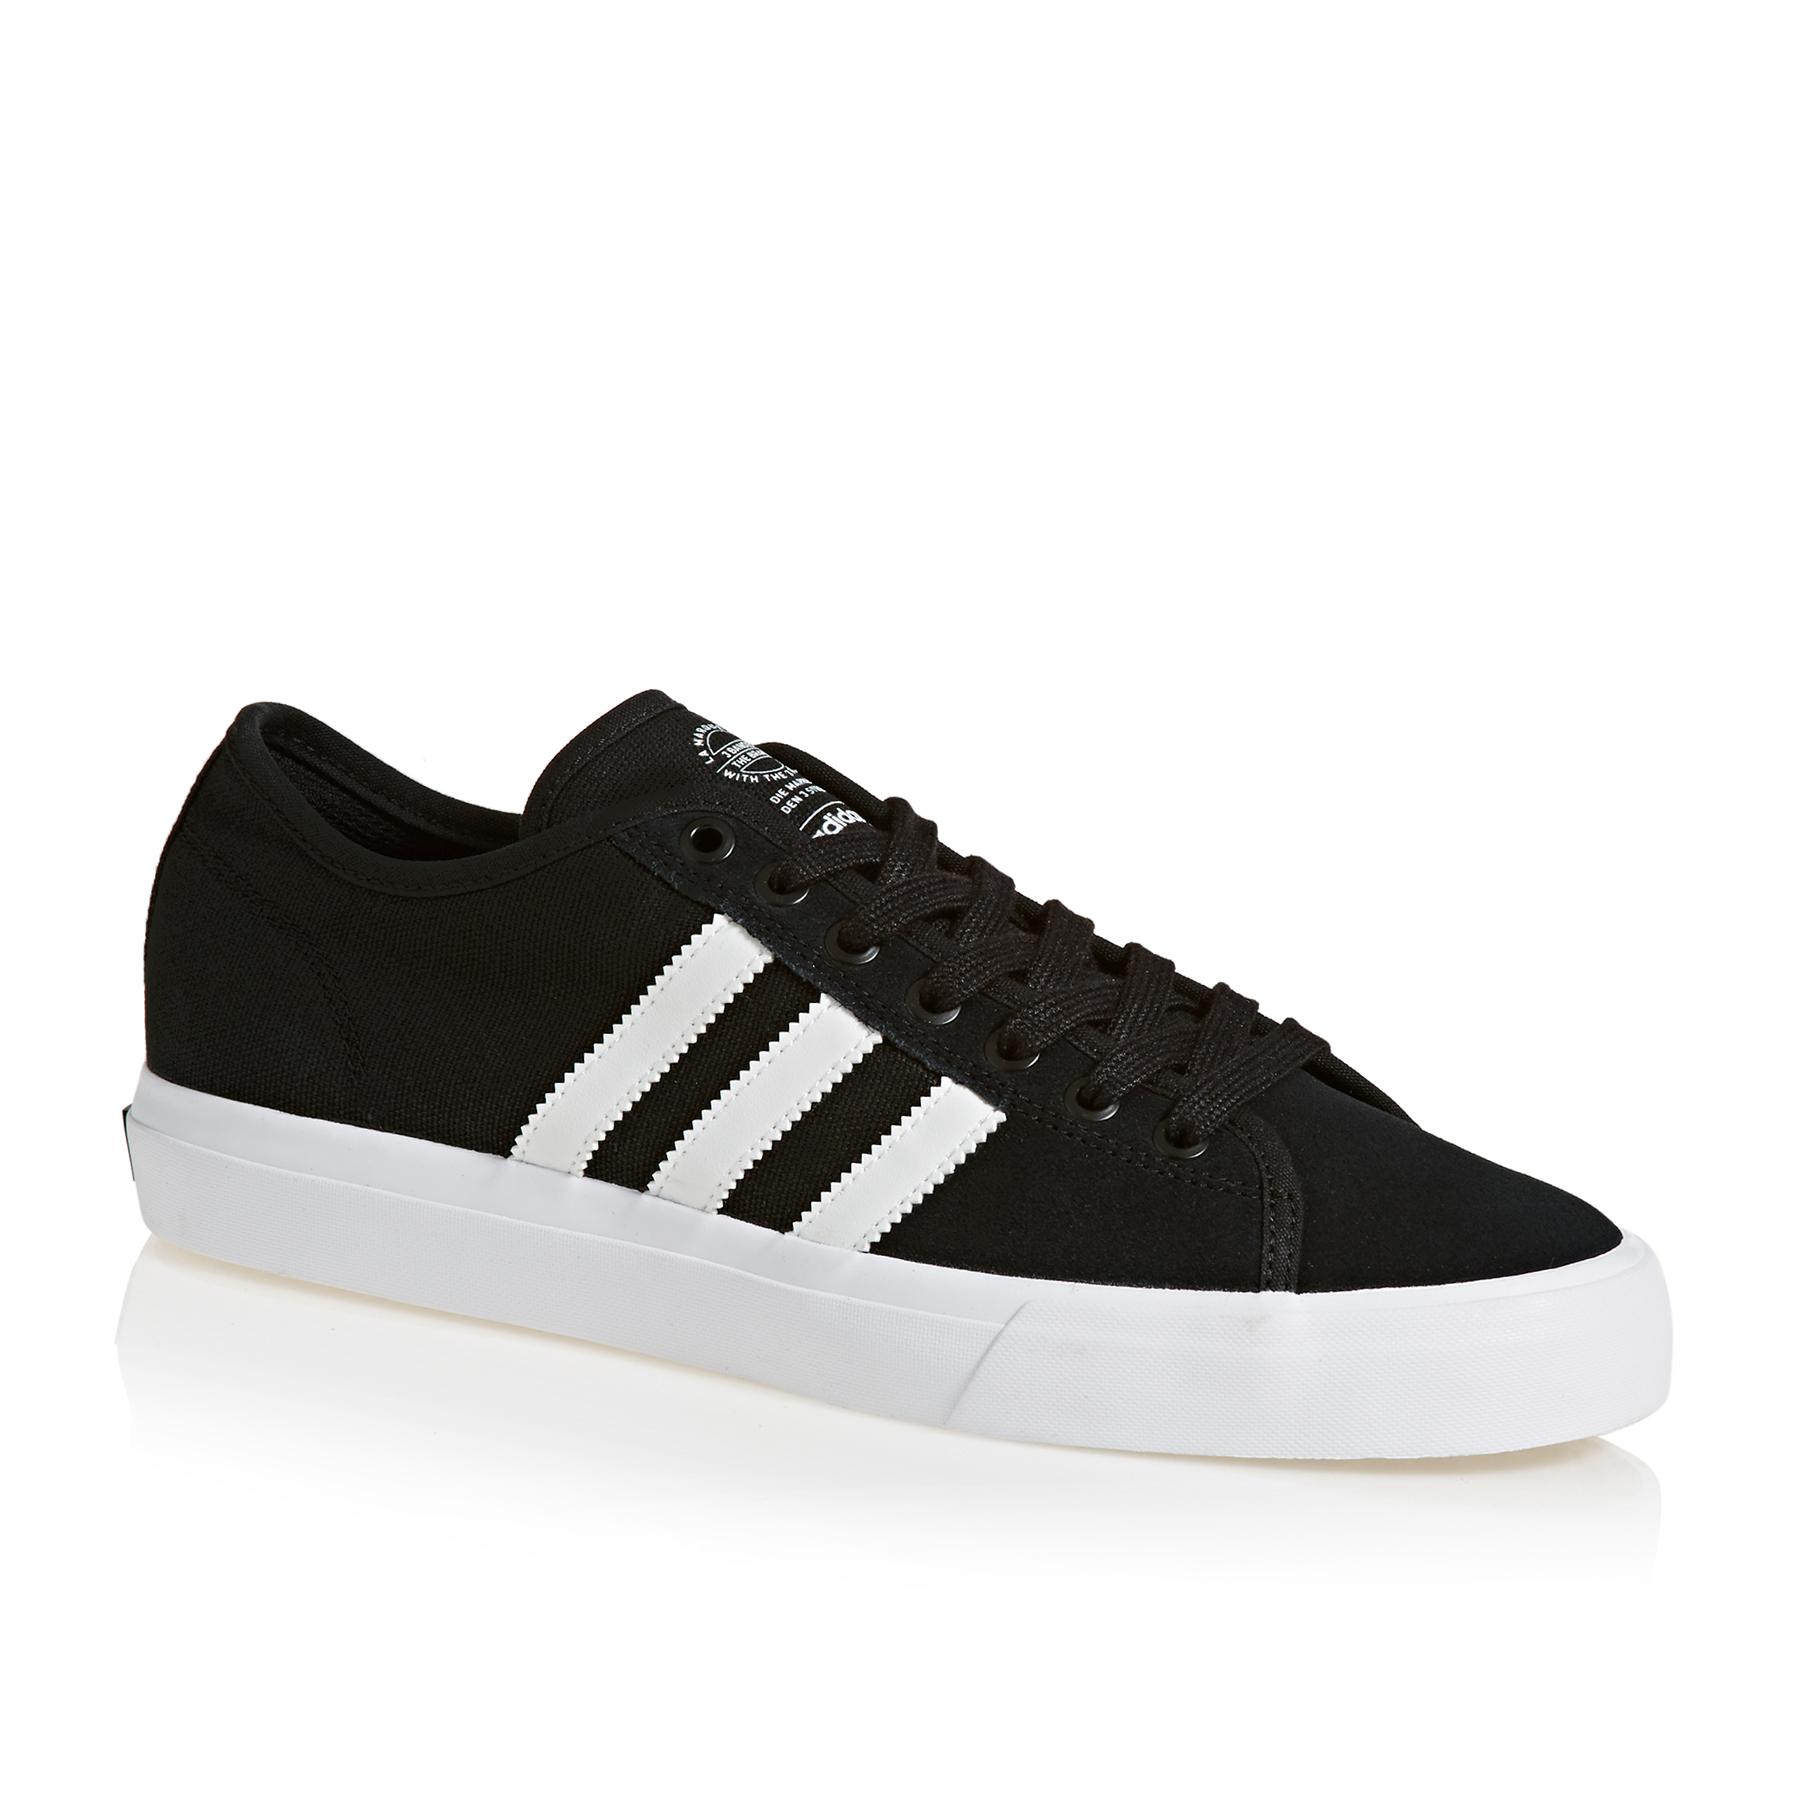 Adidas Matchcourt RX Shoes | Free